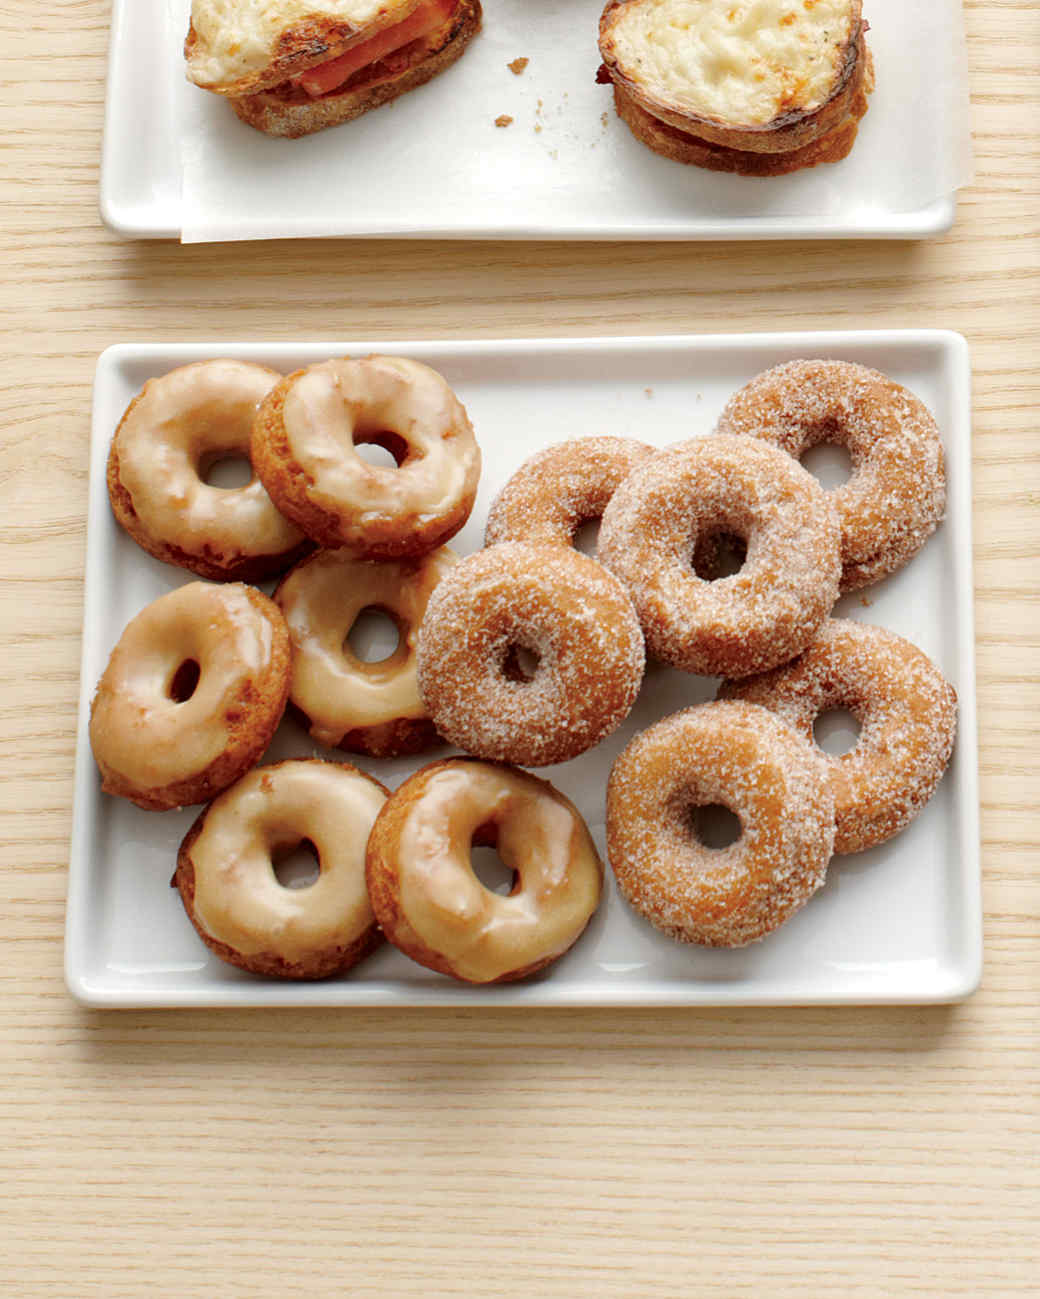 apple-cider-doughnuts-mwd107748.jpg